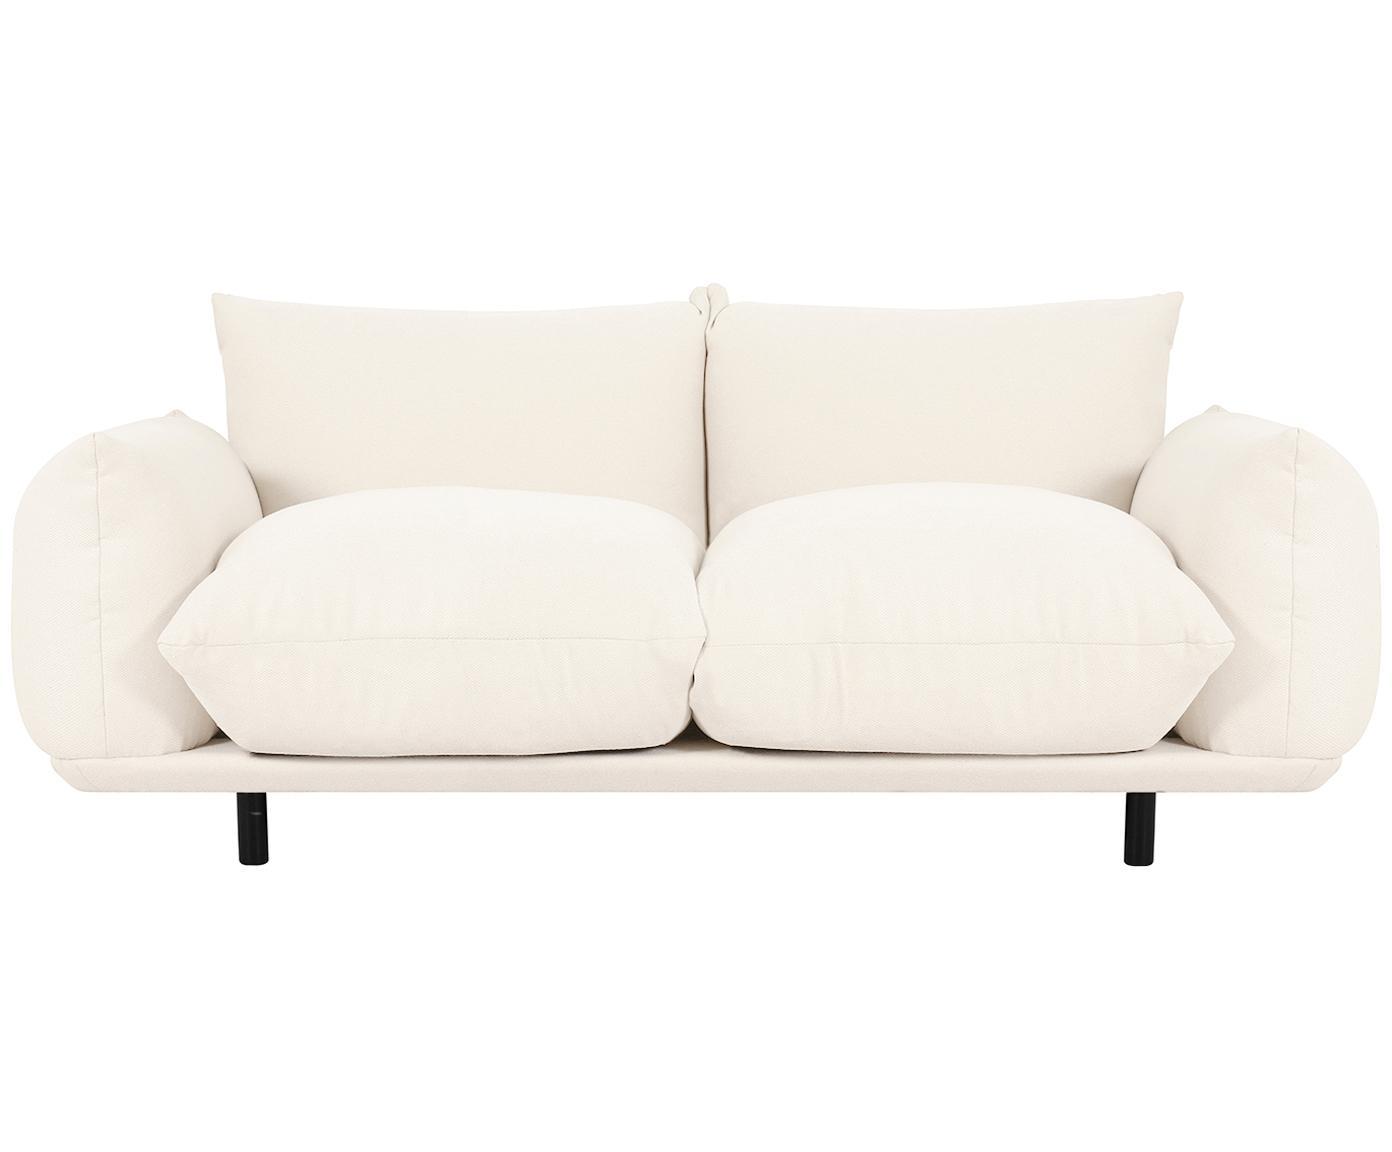 Sofa Saga (2-Sitzer), Bezug: 100% Polyester 35.000 Sch, Gestell: Massives Birkenholz, Füße: Metall, pulverbeschichtet, Webstoff Beige, B 170 x T 103 cm